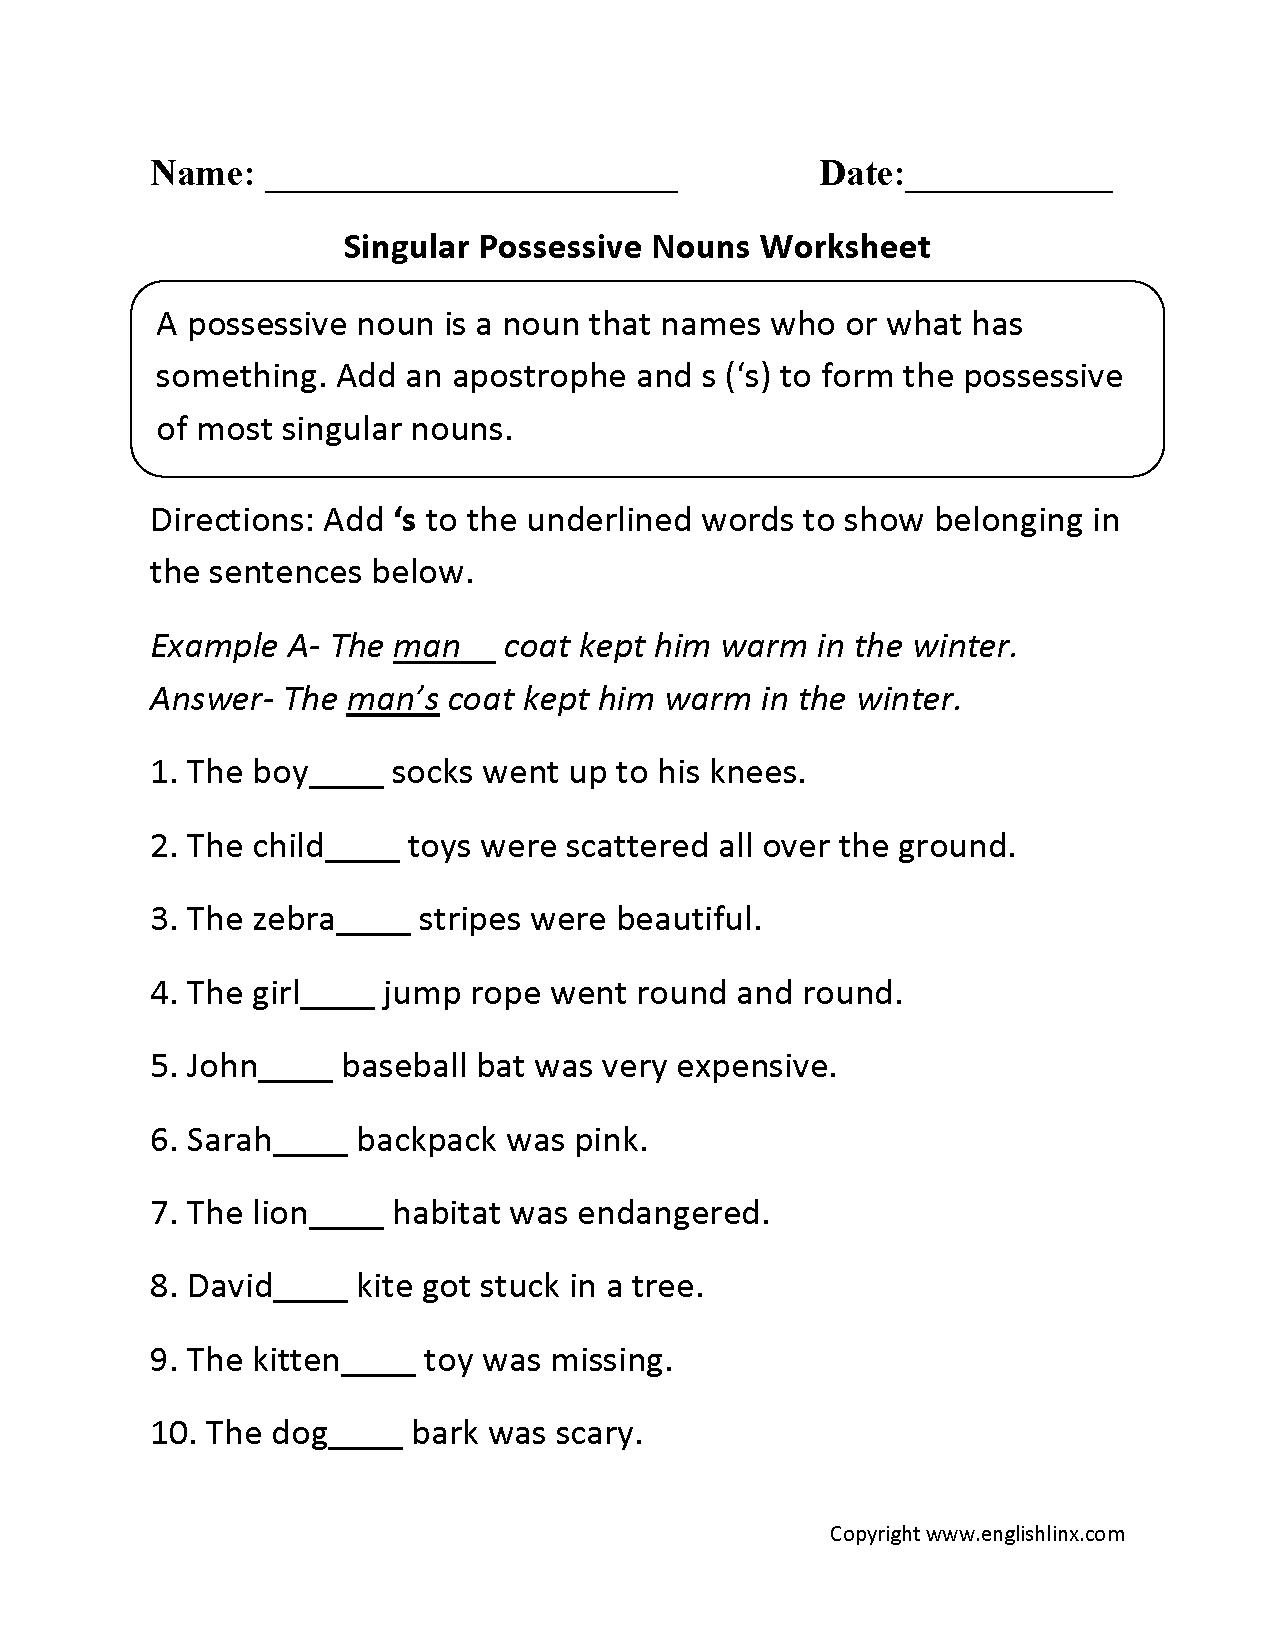 hight resolution of Possessive Nouns Worksheets   Singular Possessive Nouns Worksheets